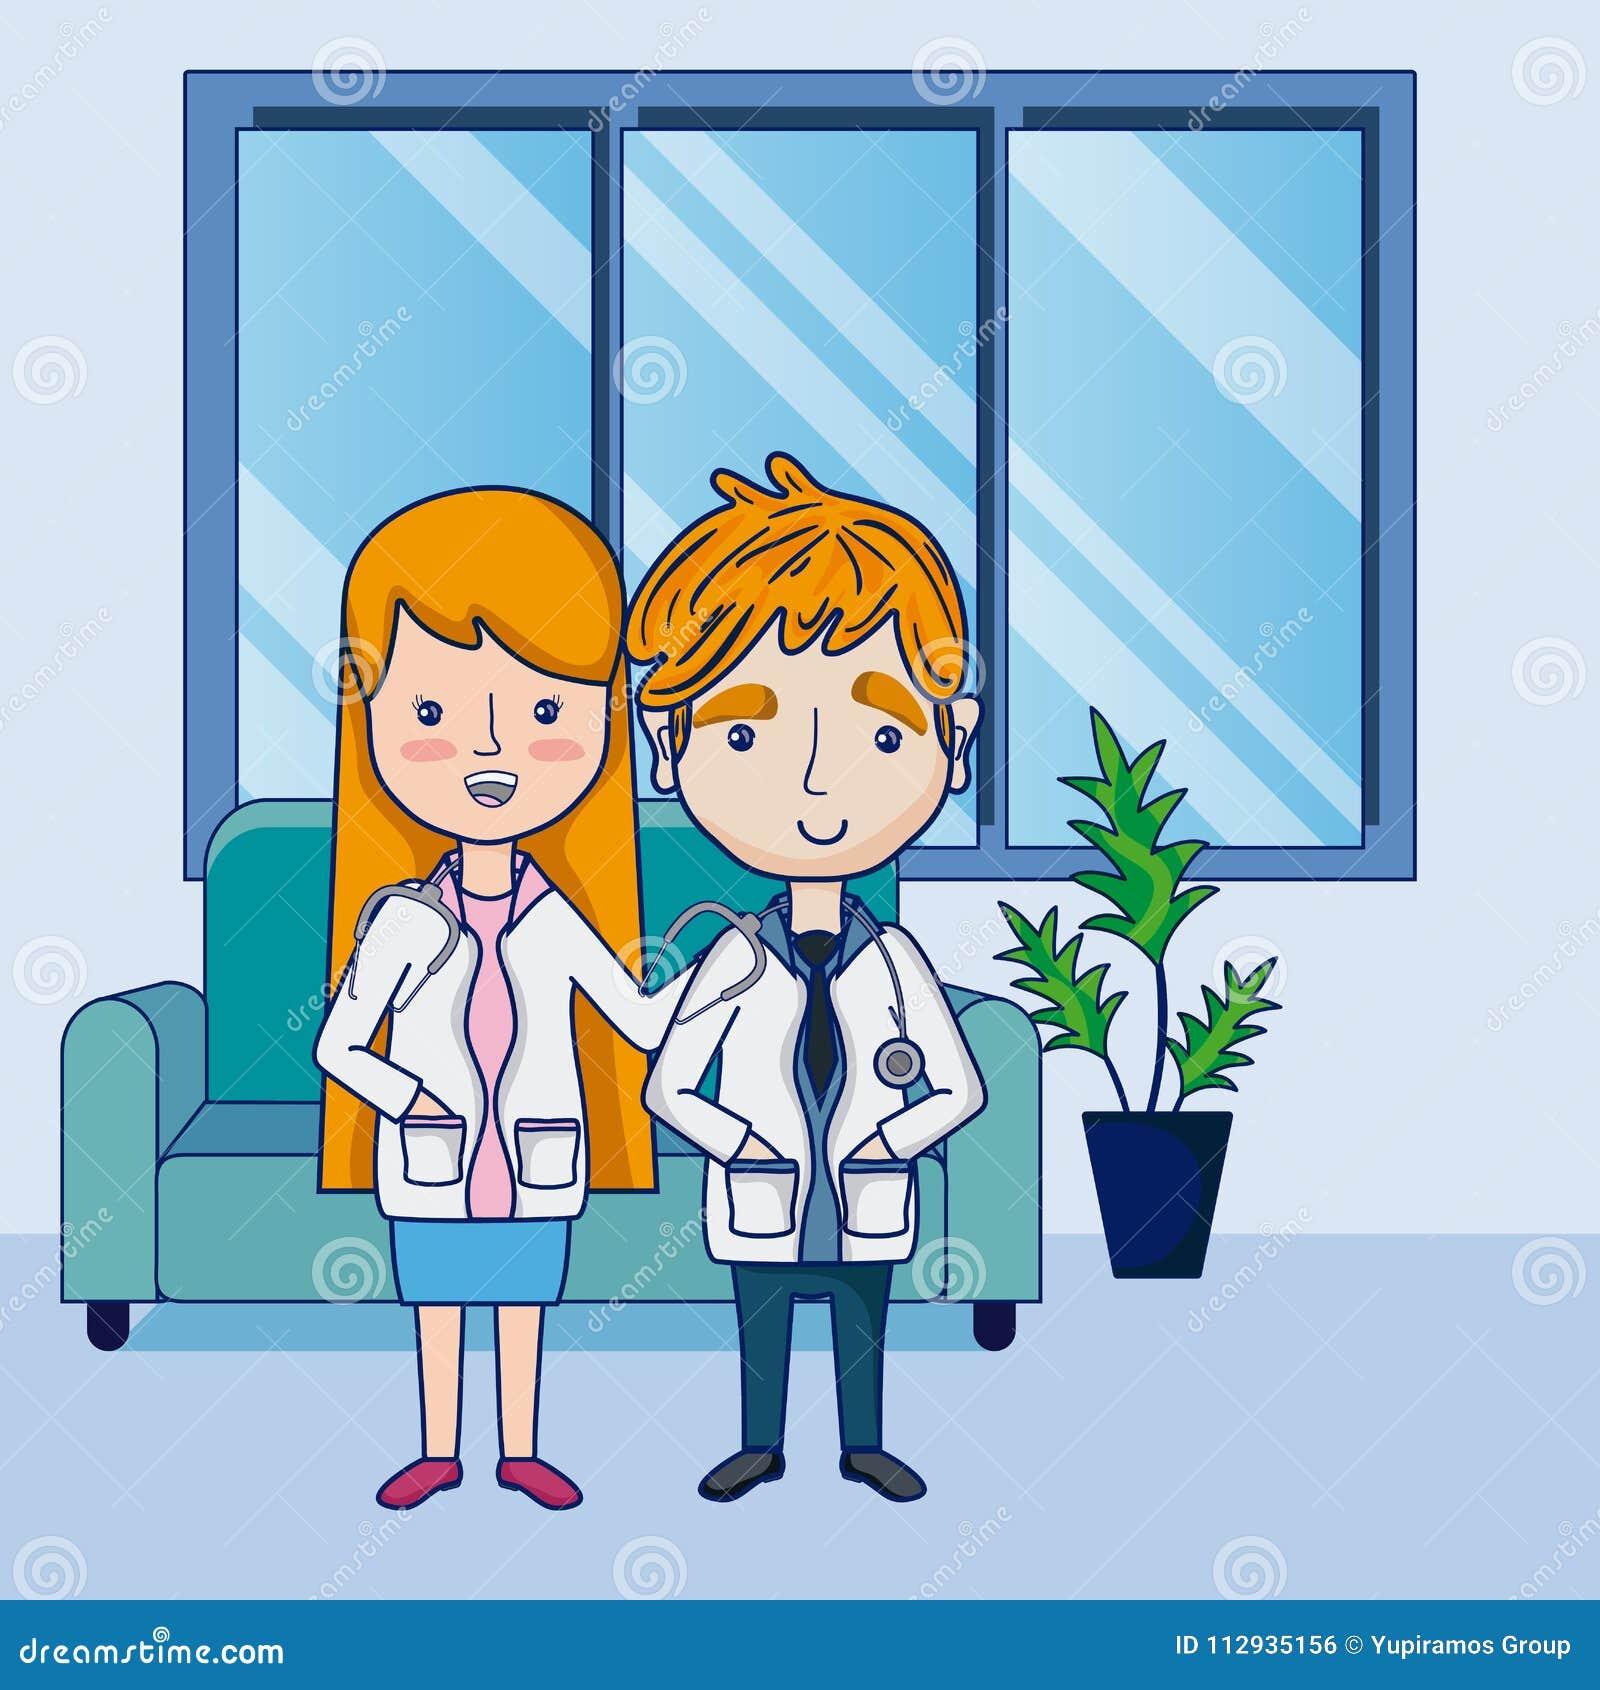 Funny Cartoon Hospital Pics funny doctors cartoons stock vector. illustration of comic